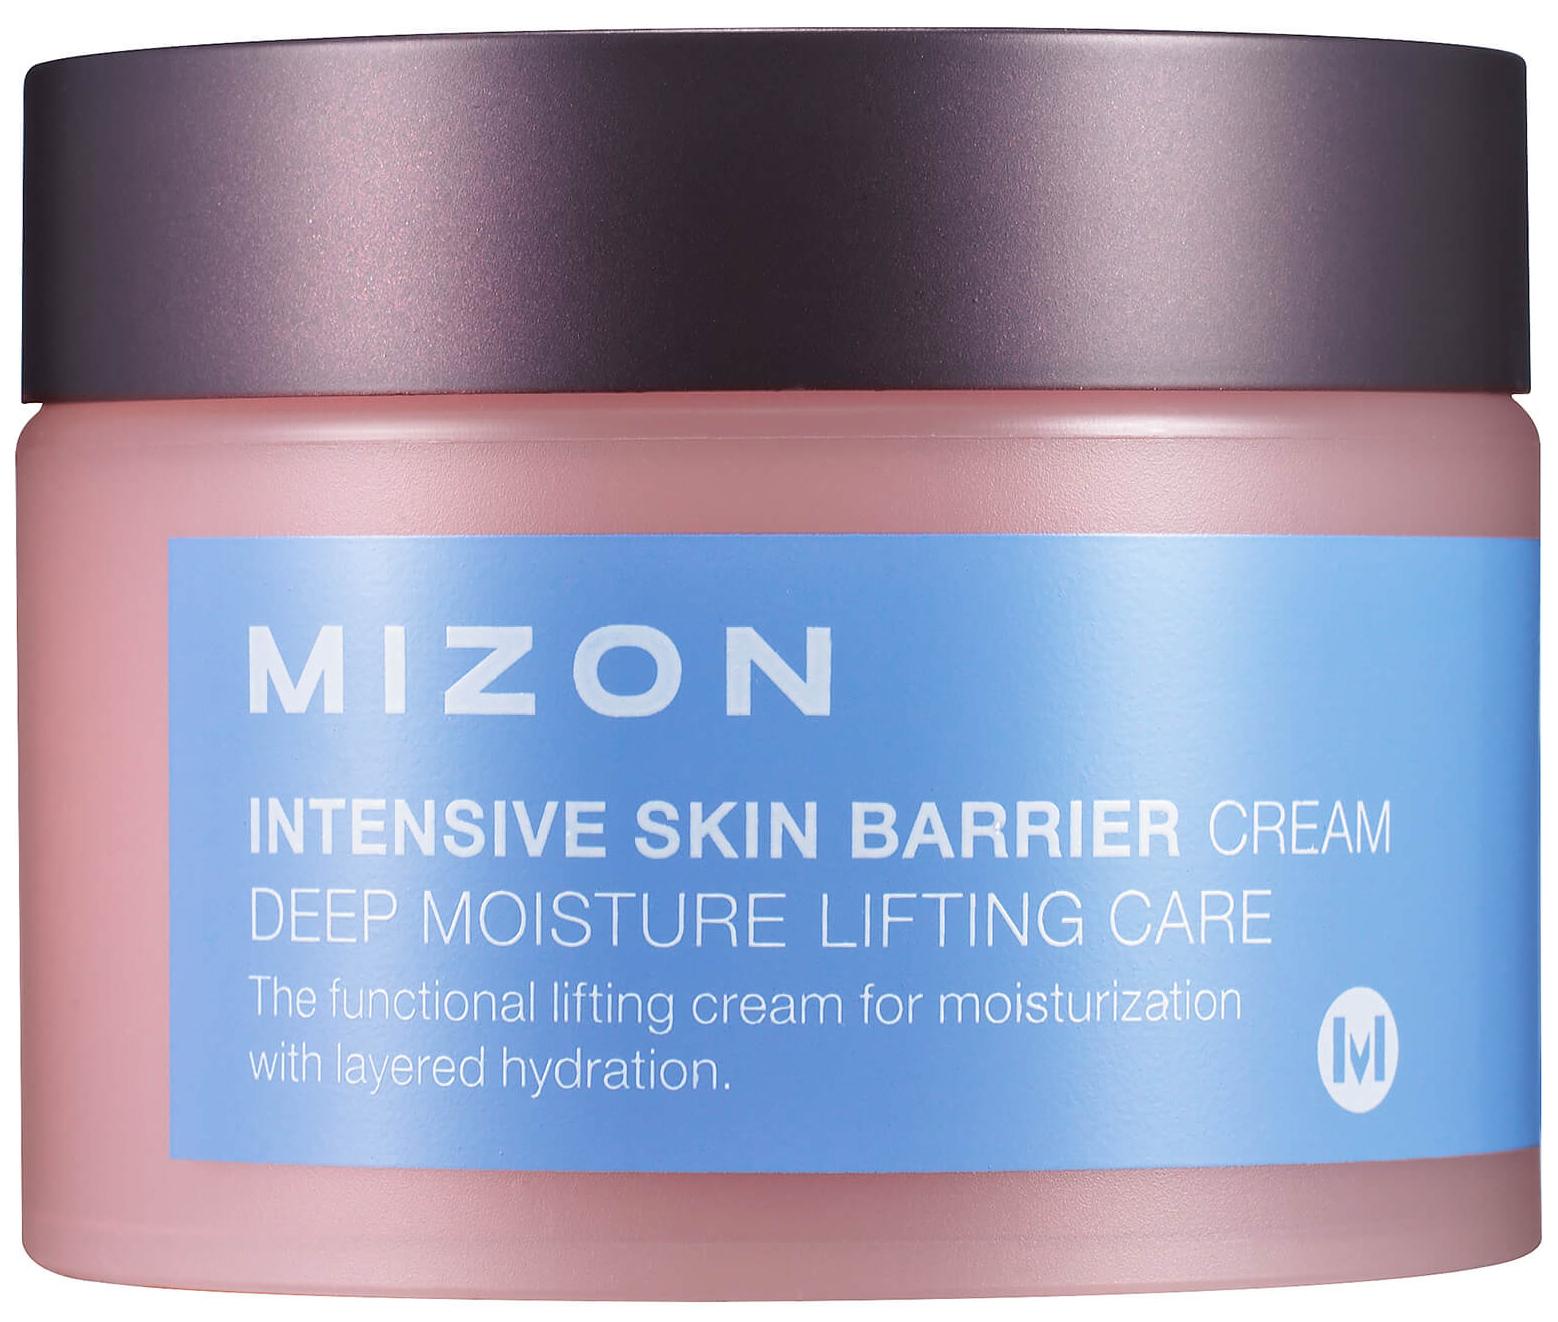 Крем для лица Mizon Intensive Skin Barrier Cream 50 мл